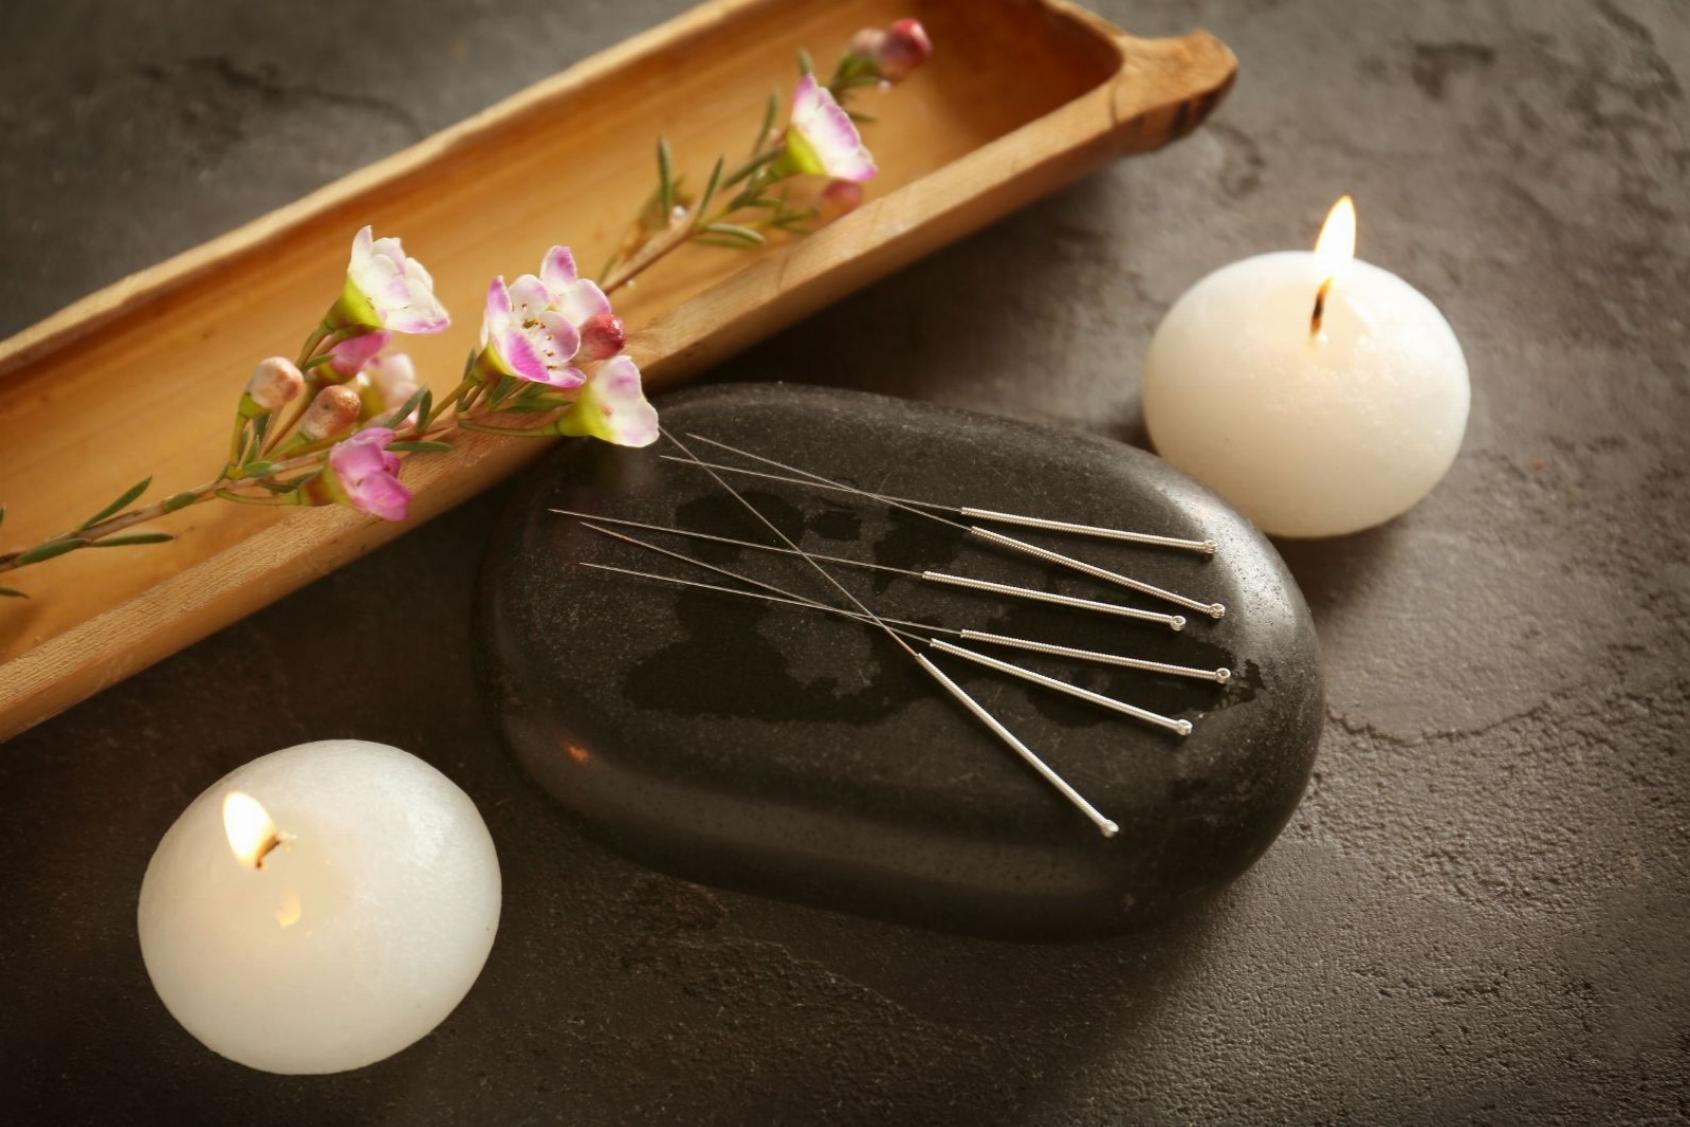 Acupunctuur: Huidaandoening, Cosmetisch (anti-ageing) en Pijnbestrijding ( Dr. Tan & Mr. Tung)